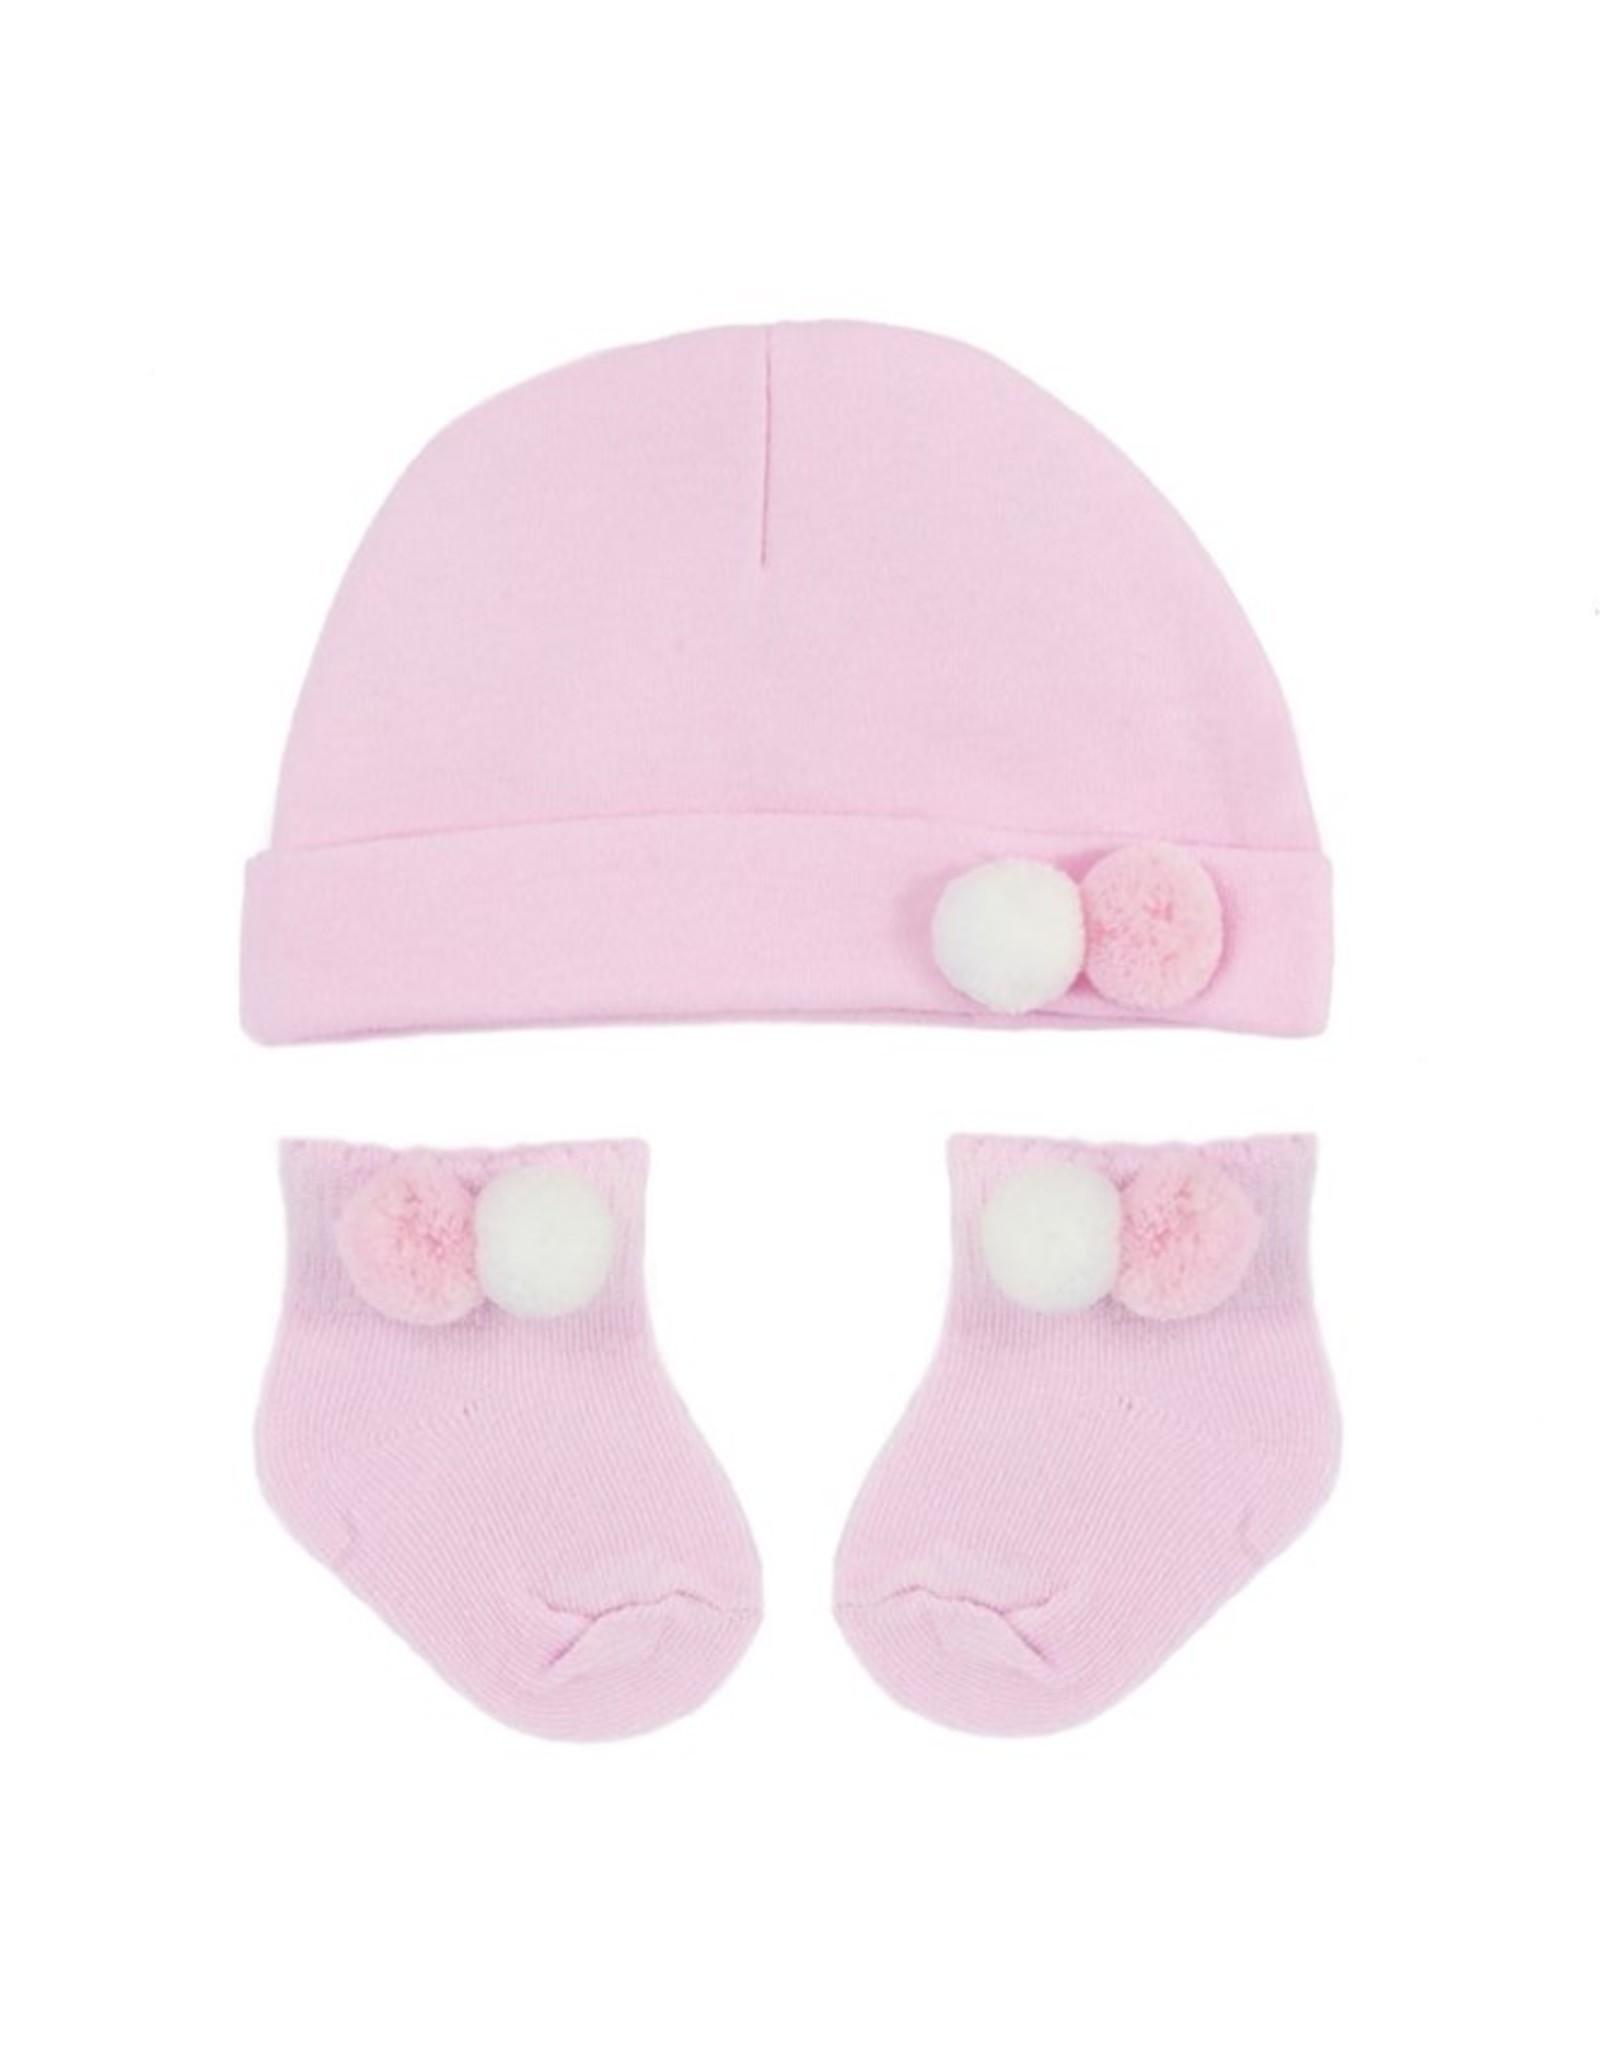 Muts en sokjes  roze/wit  pompoms